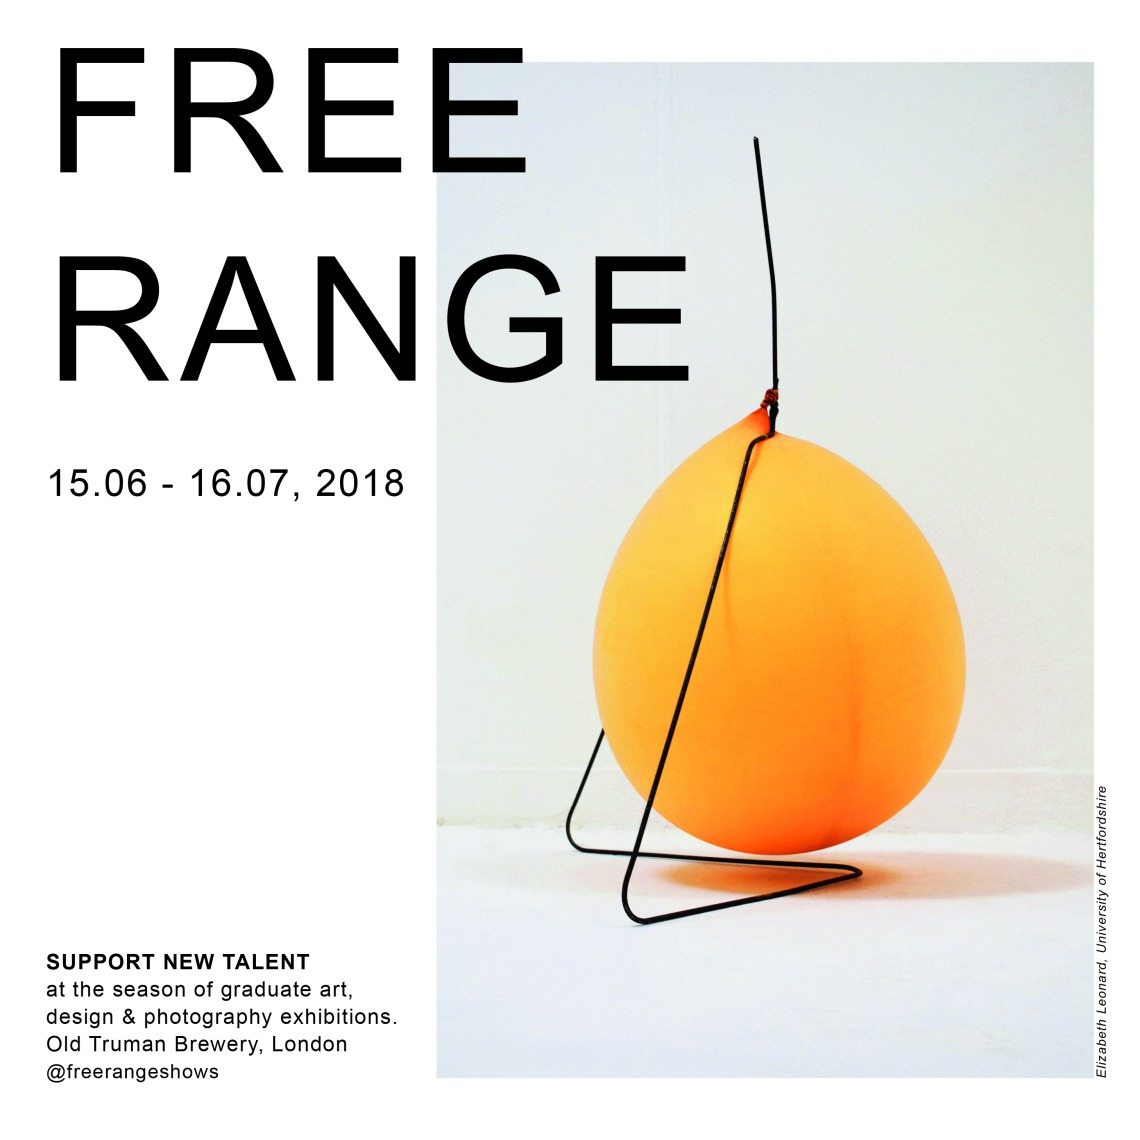 Free-Range-2018-General-Ad-Elizabeth-Leonard-artwork